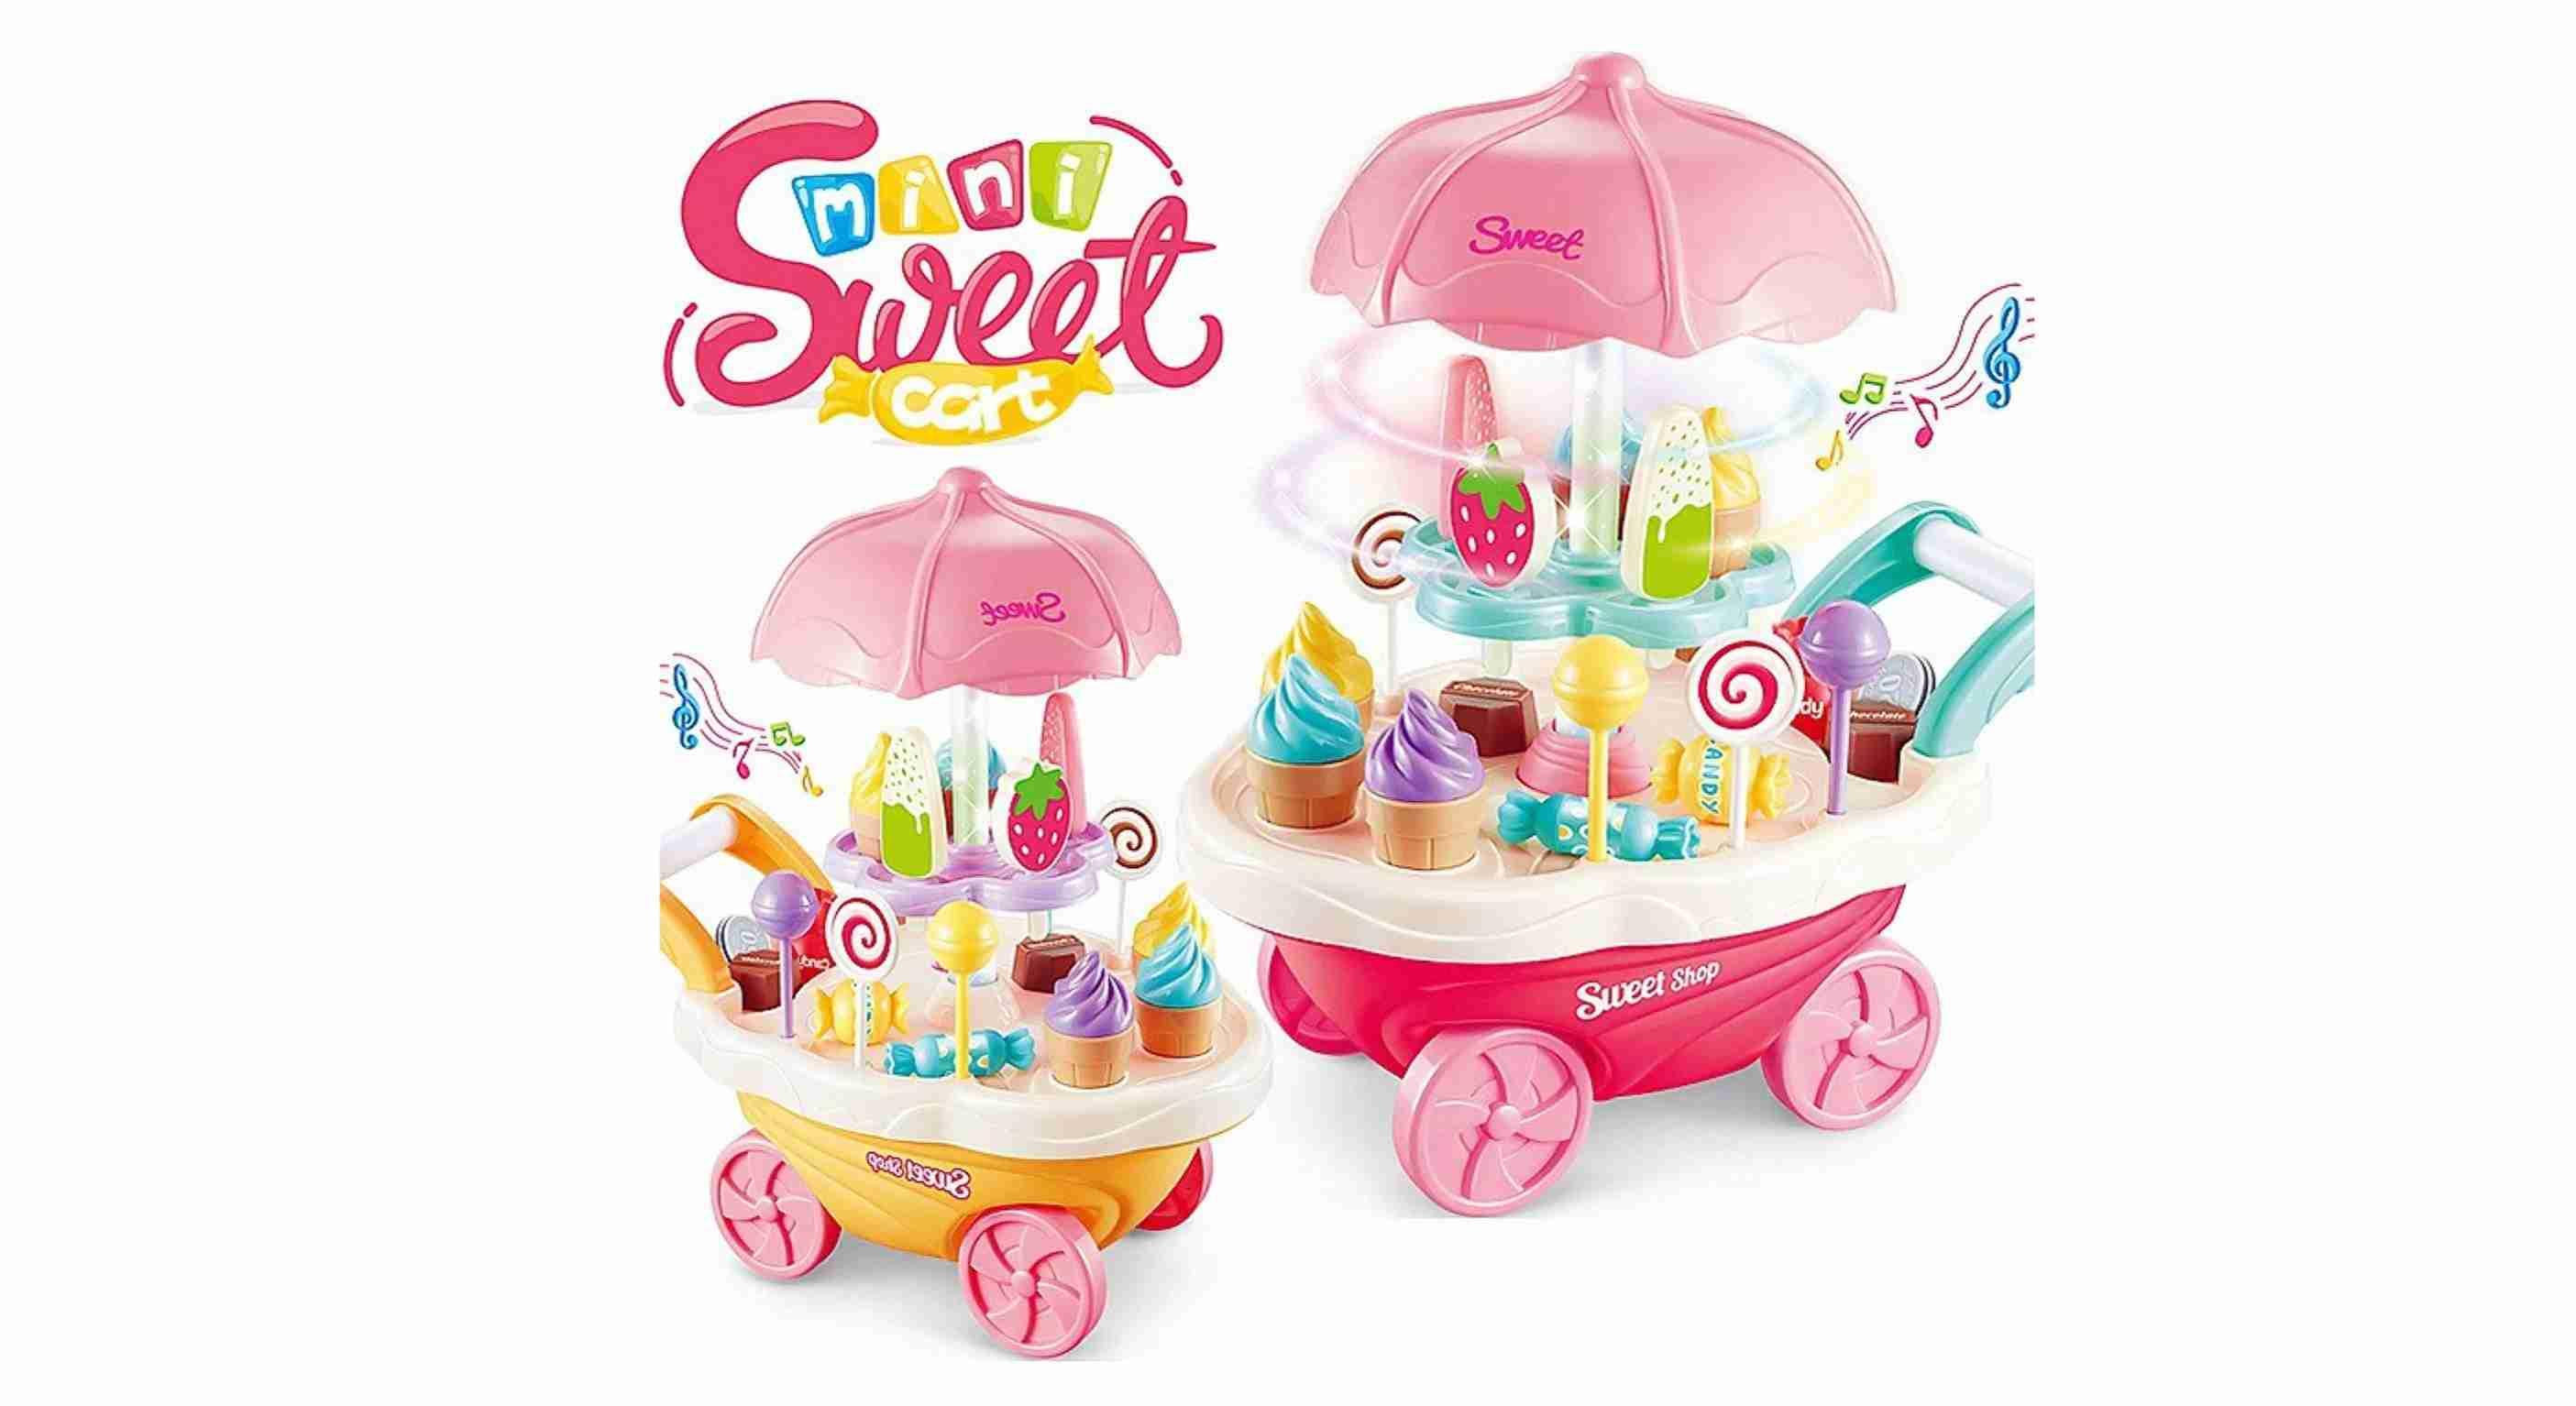 Ice Cream Toys Play set